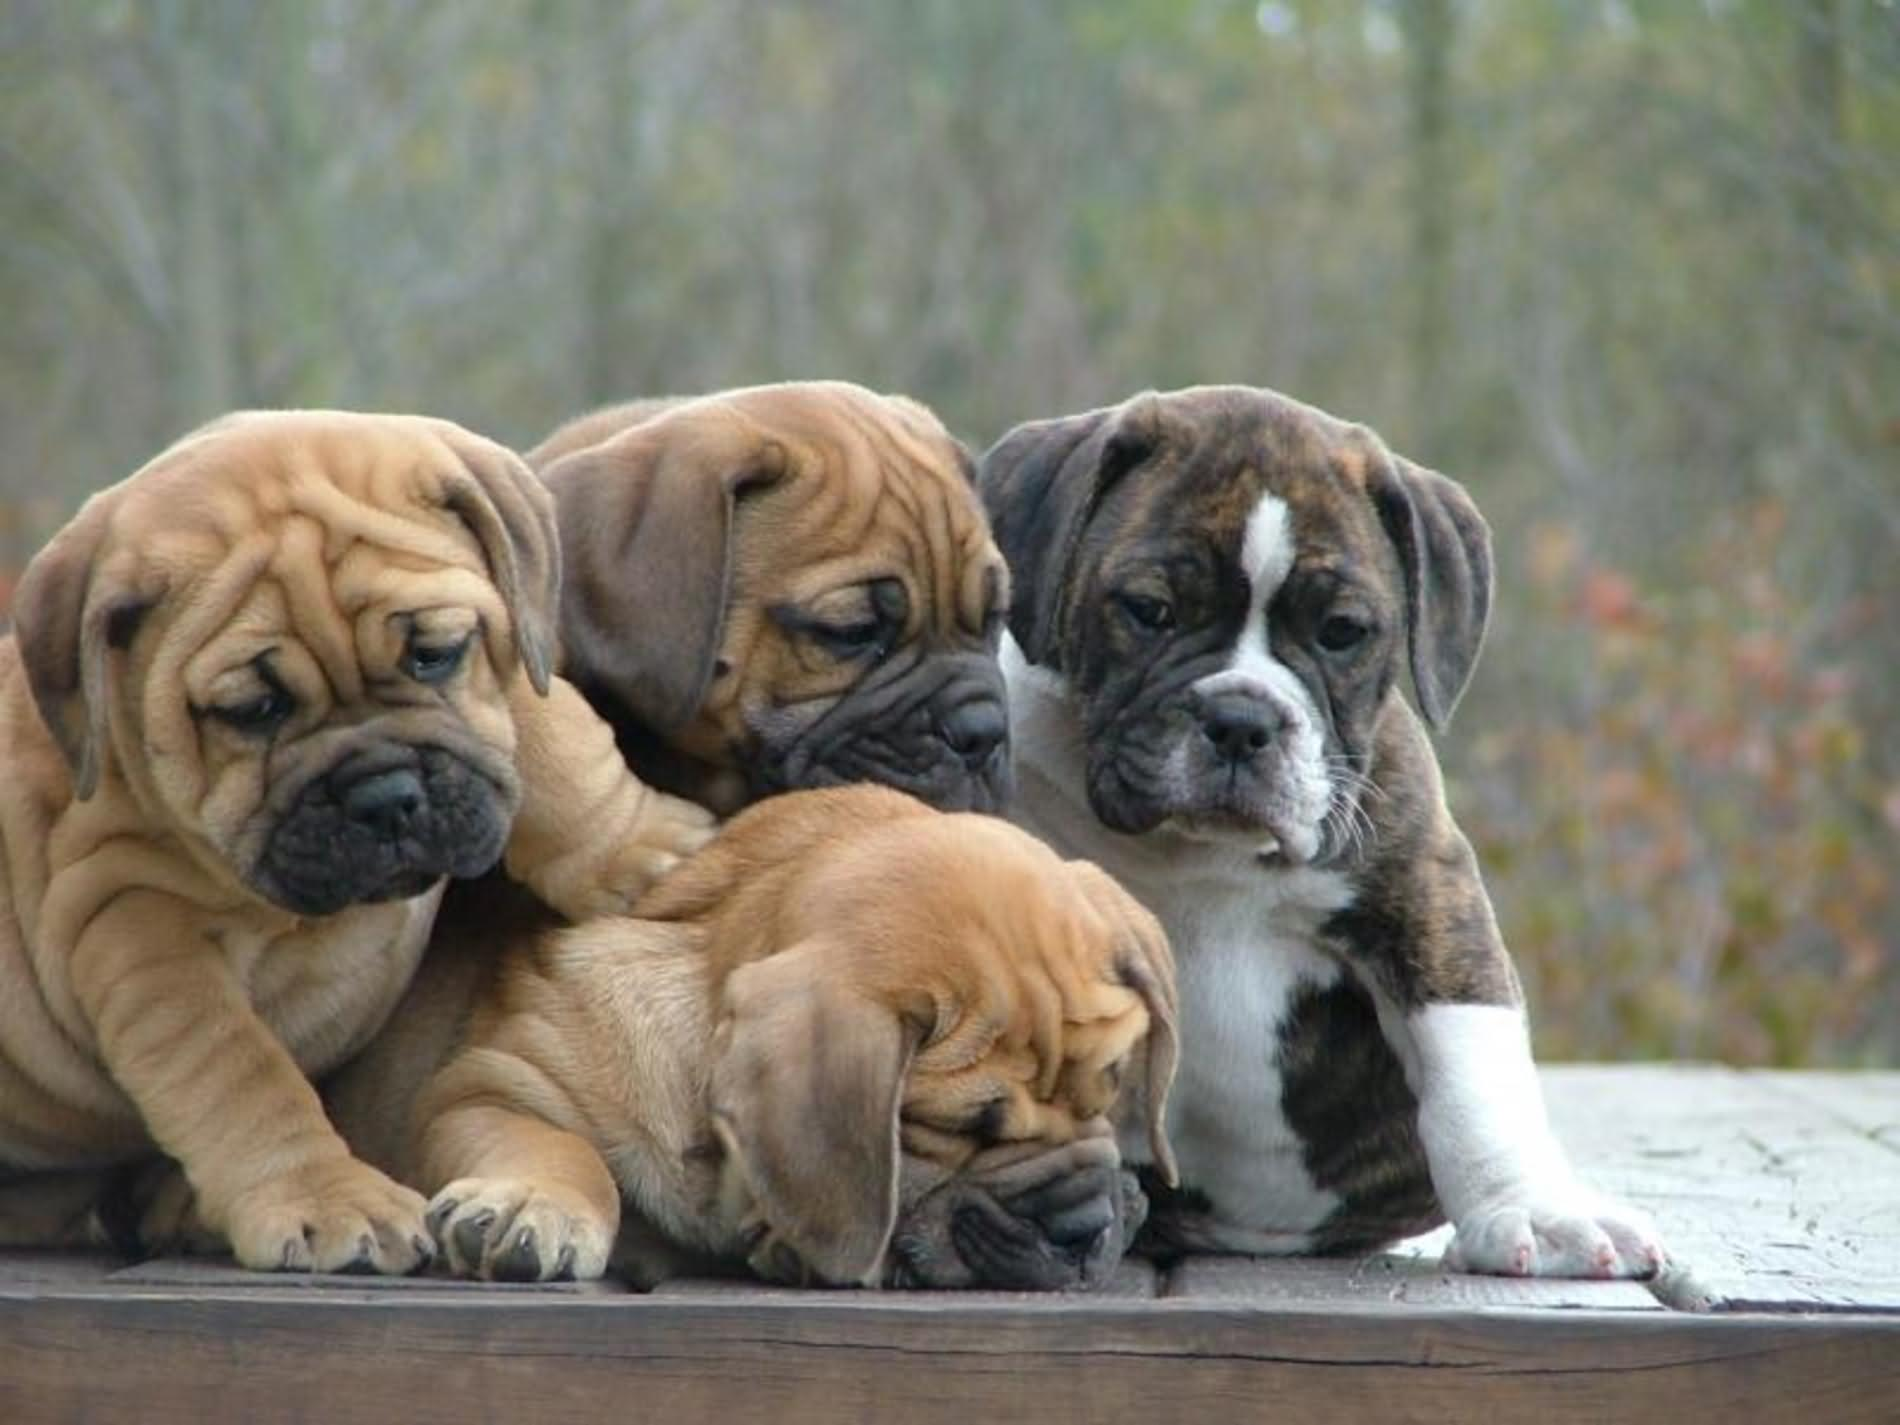 Beautiful Bulldog Puppies Playing